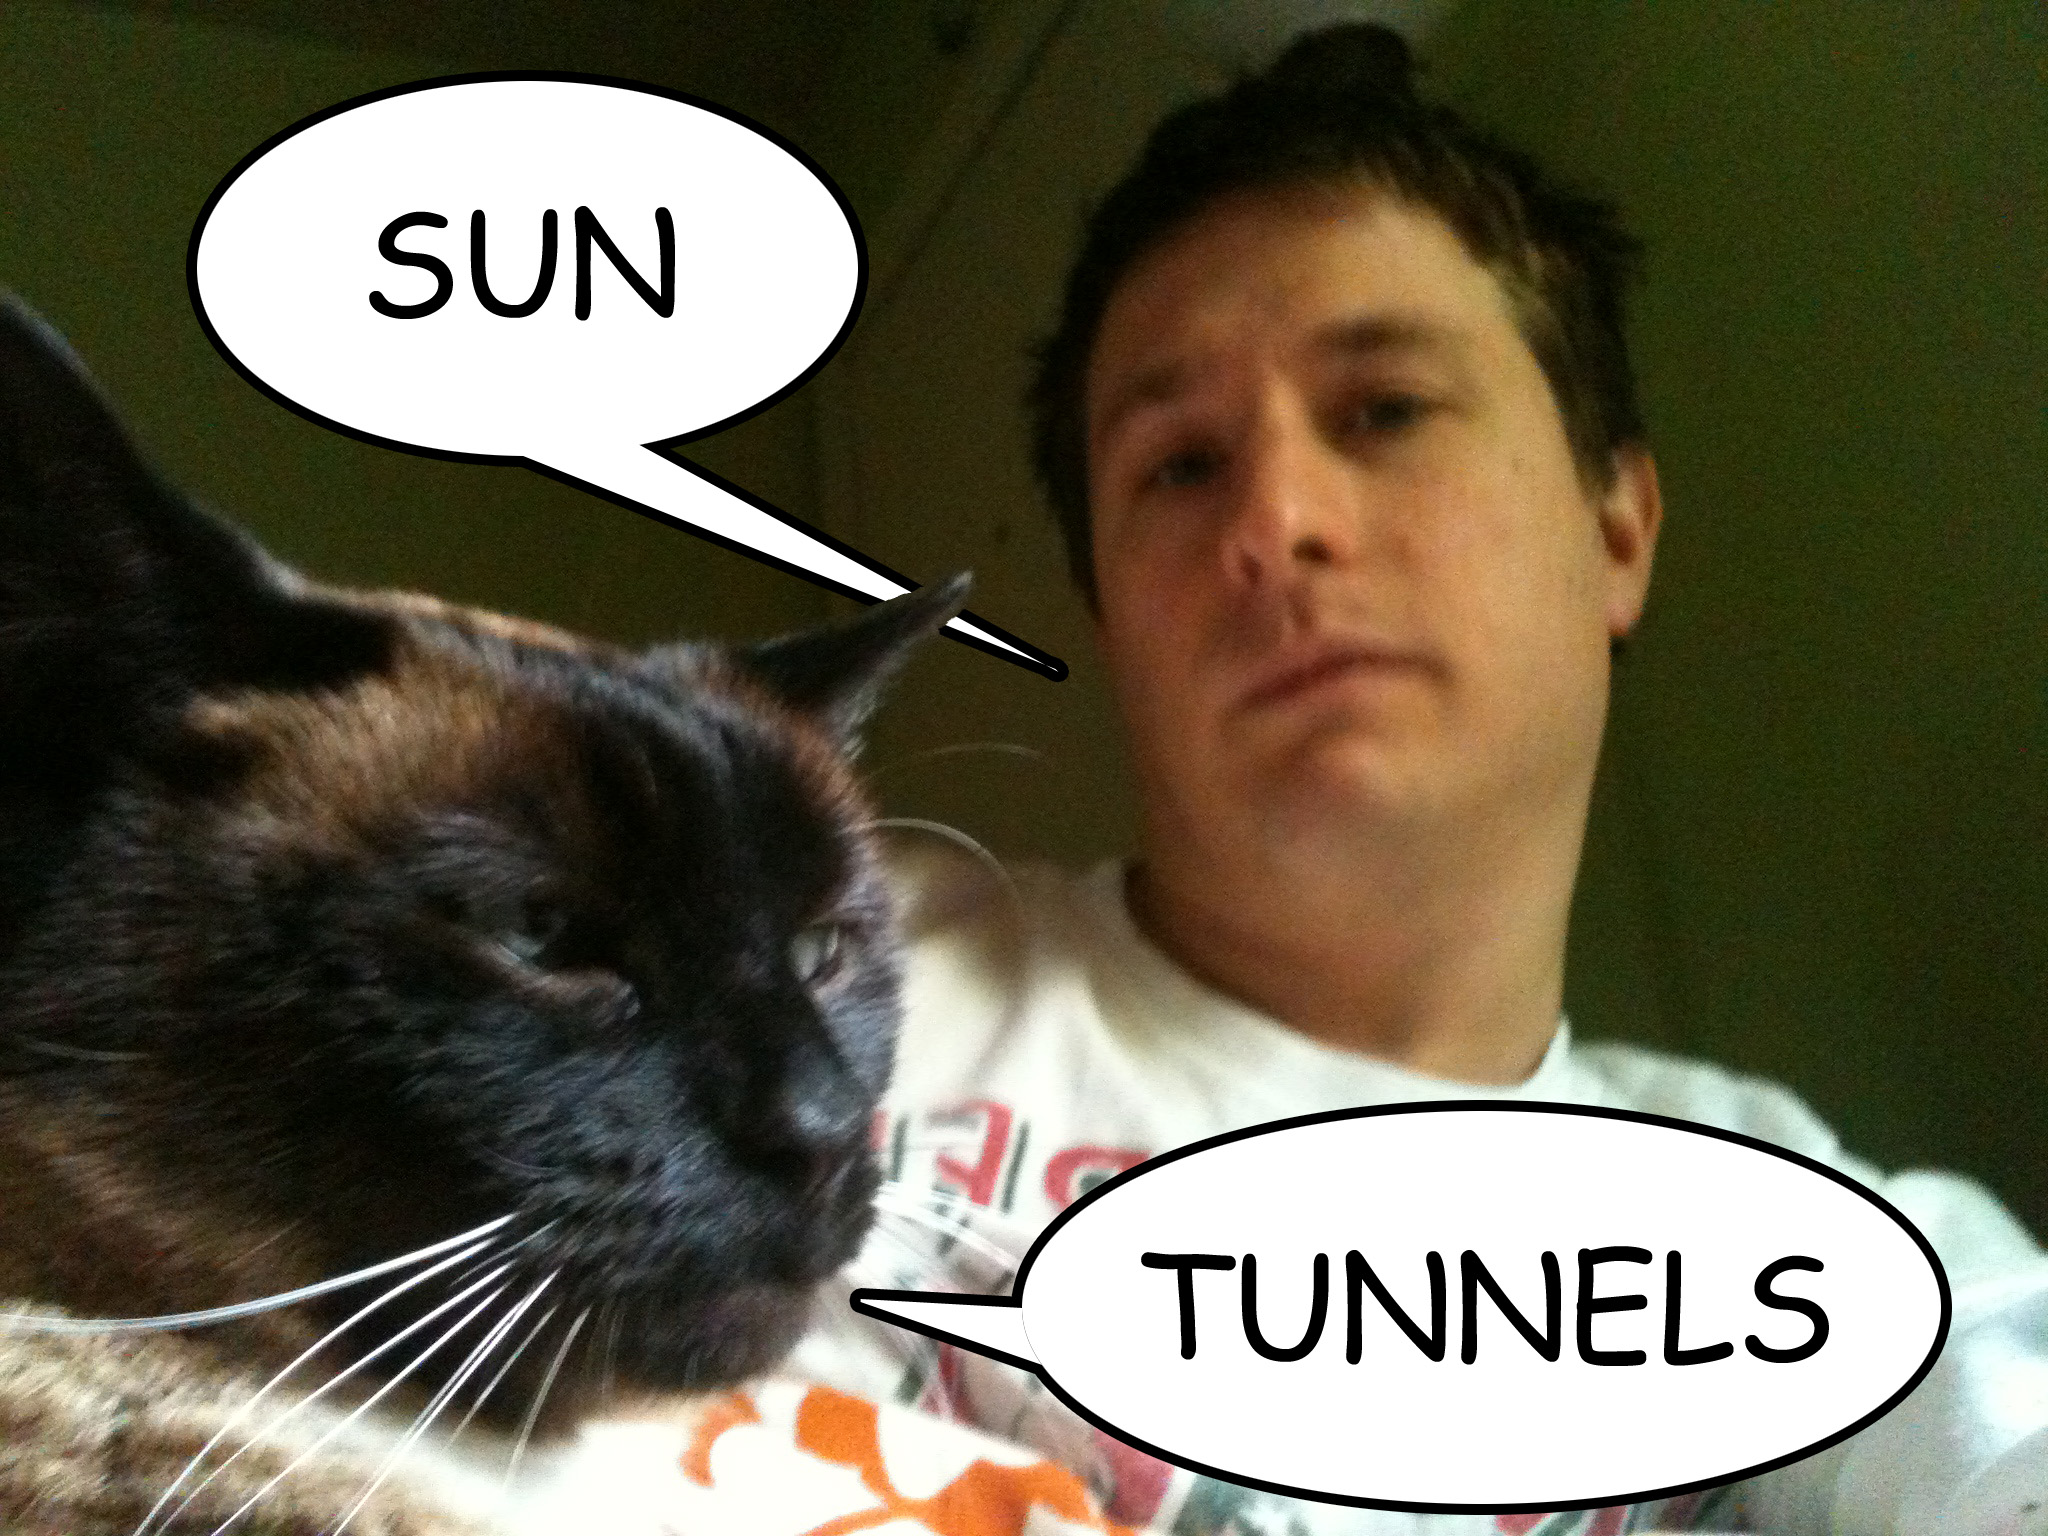 Sun Tunnels feat. Birdy